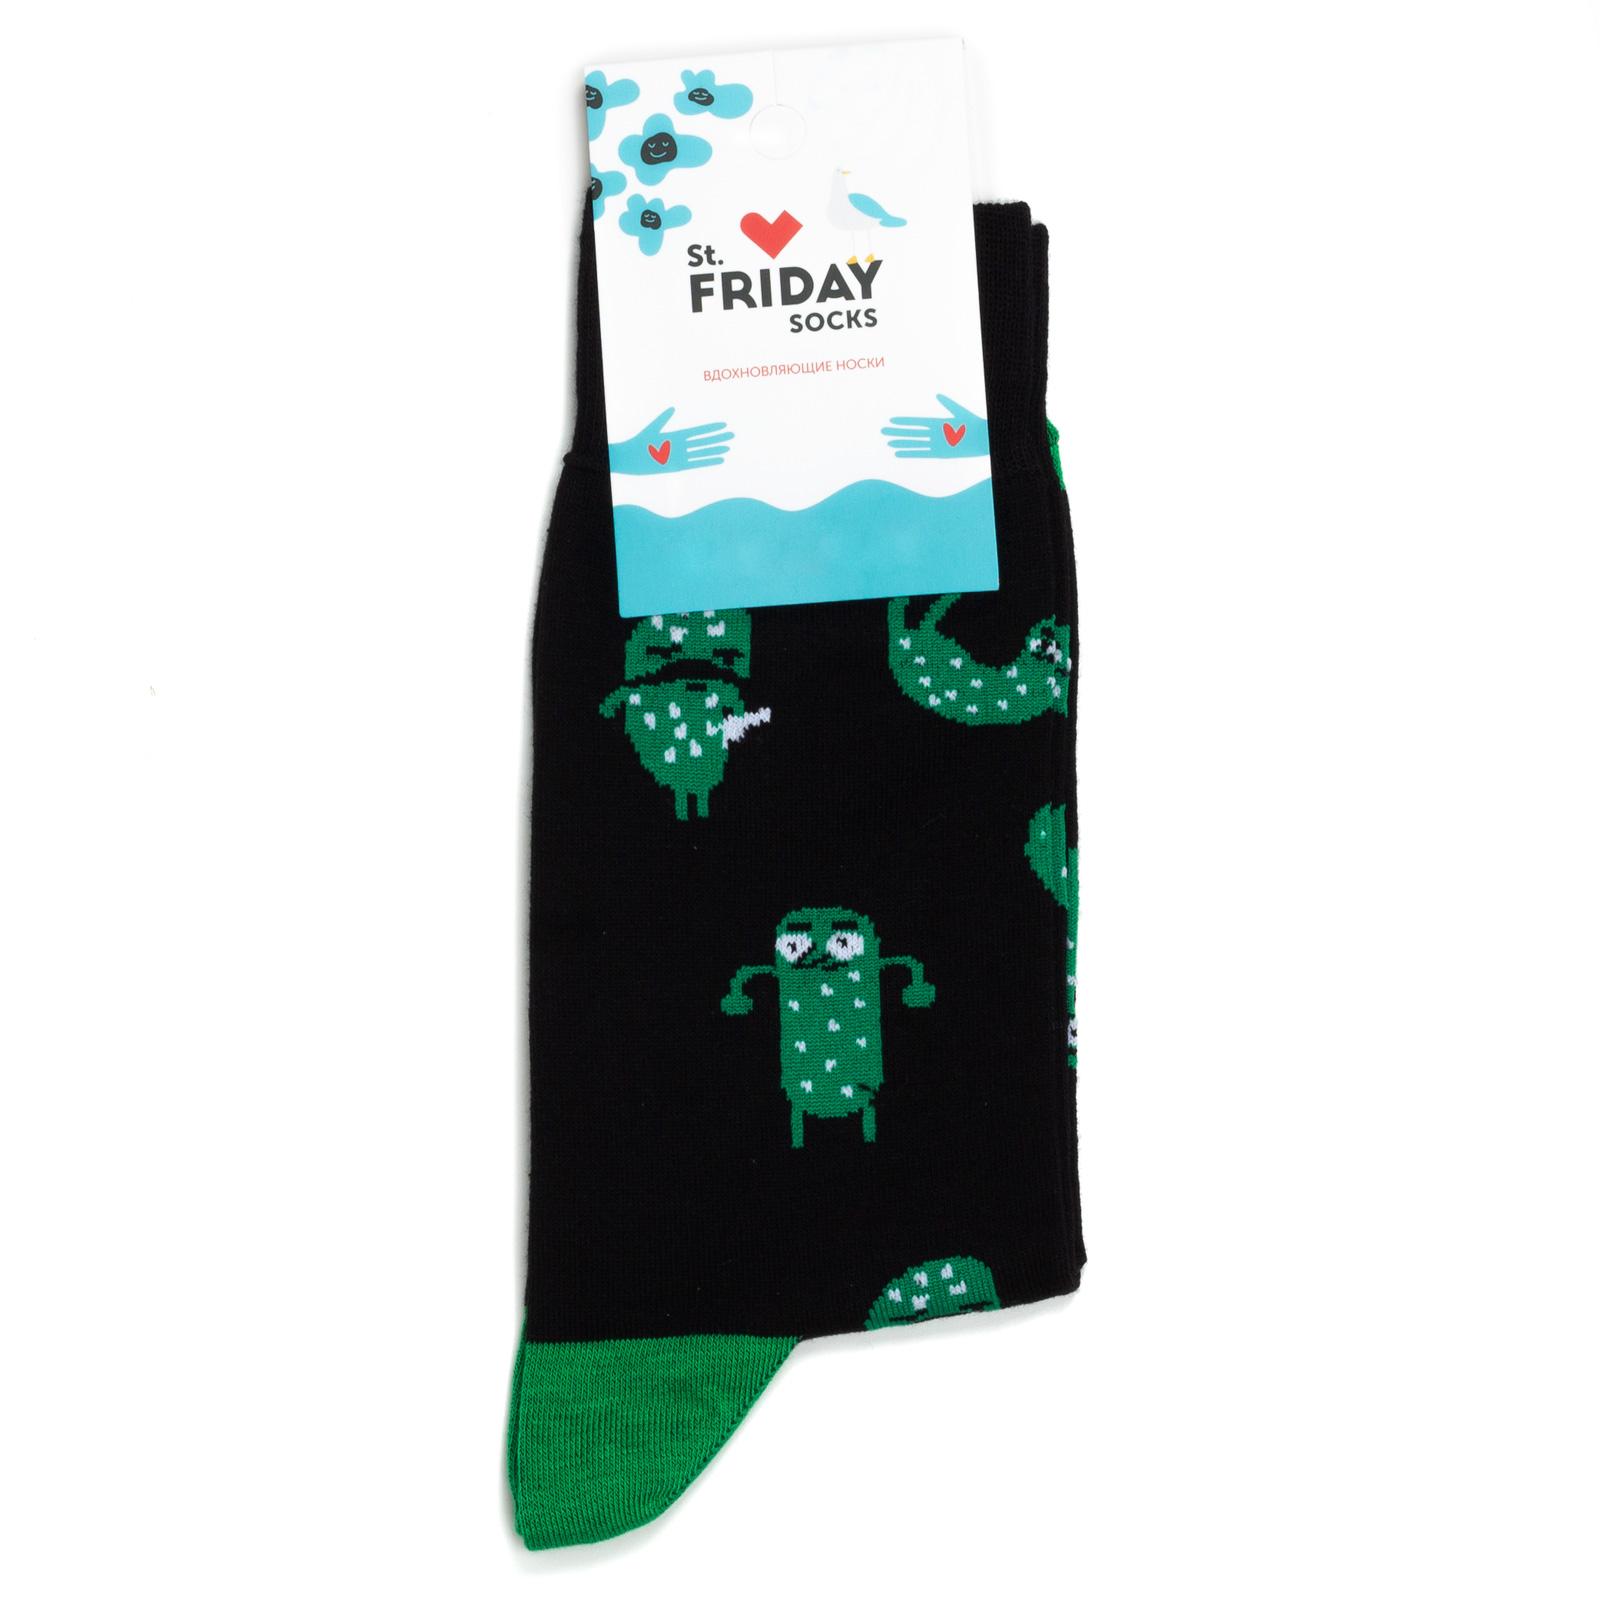 Носки унисекс St.Friday Socks STFR_Vosstanie_Ogurcov разноцветные 42-46